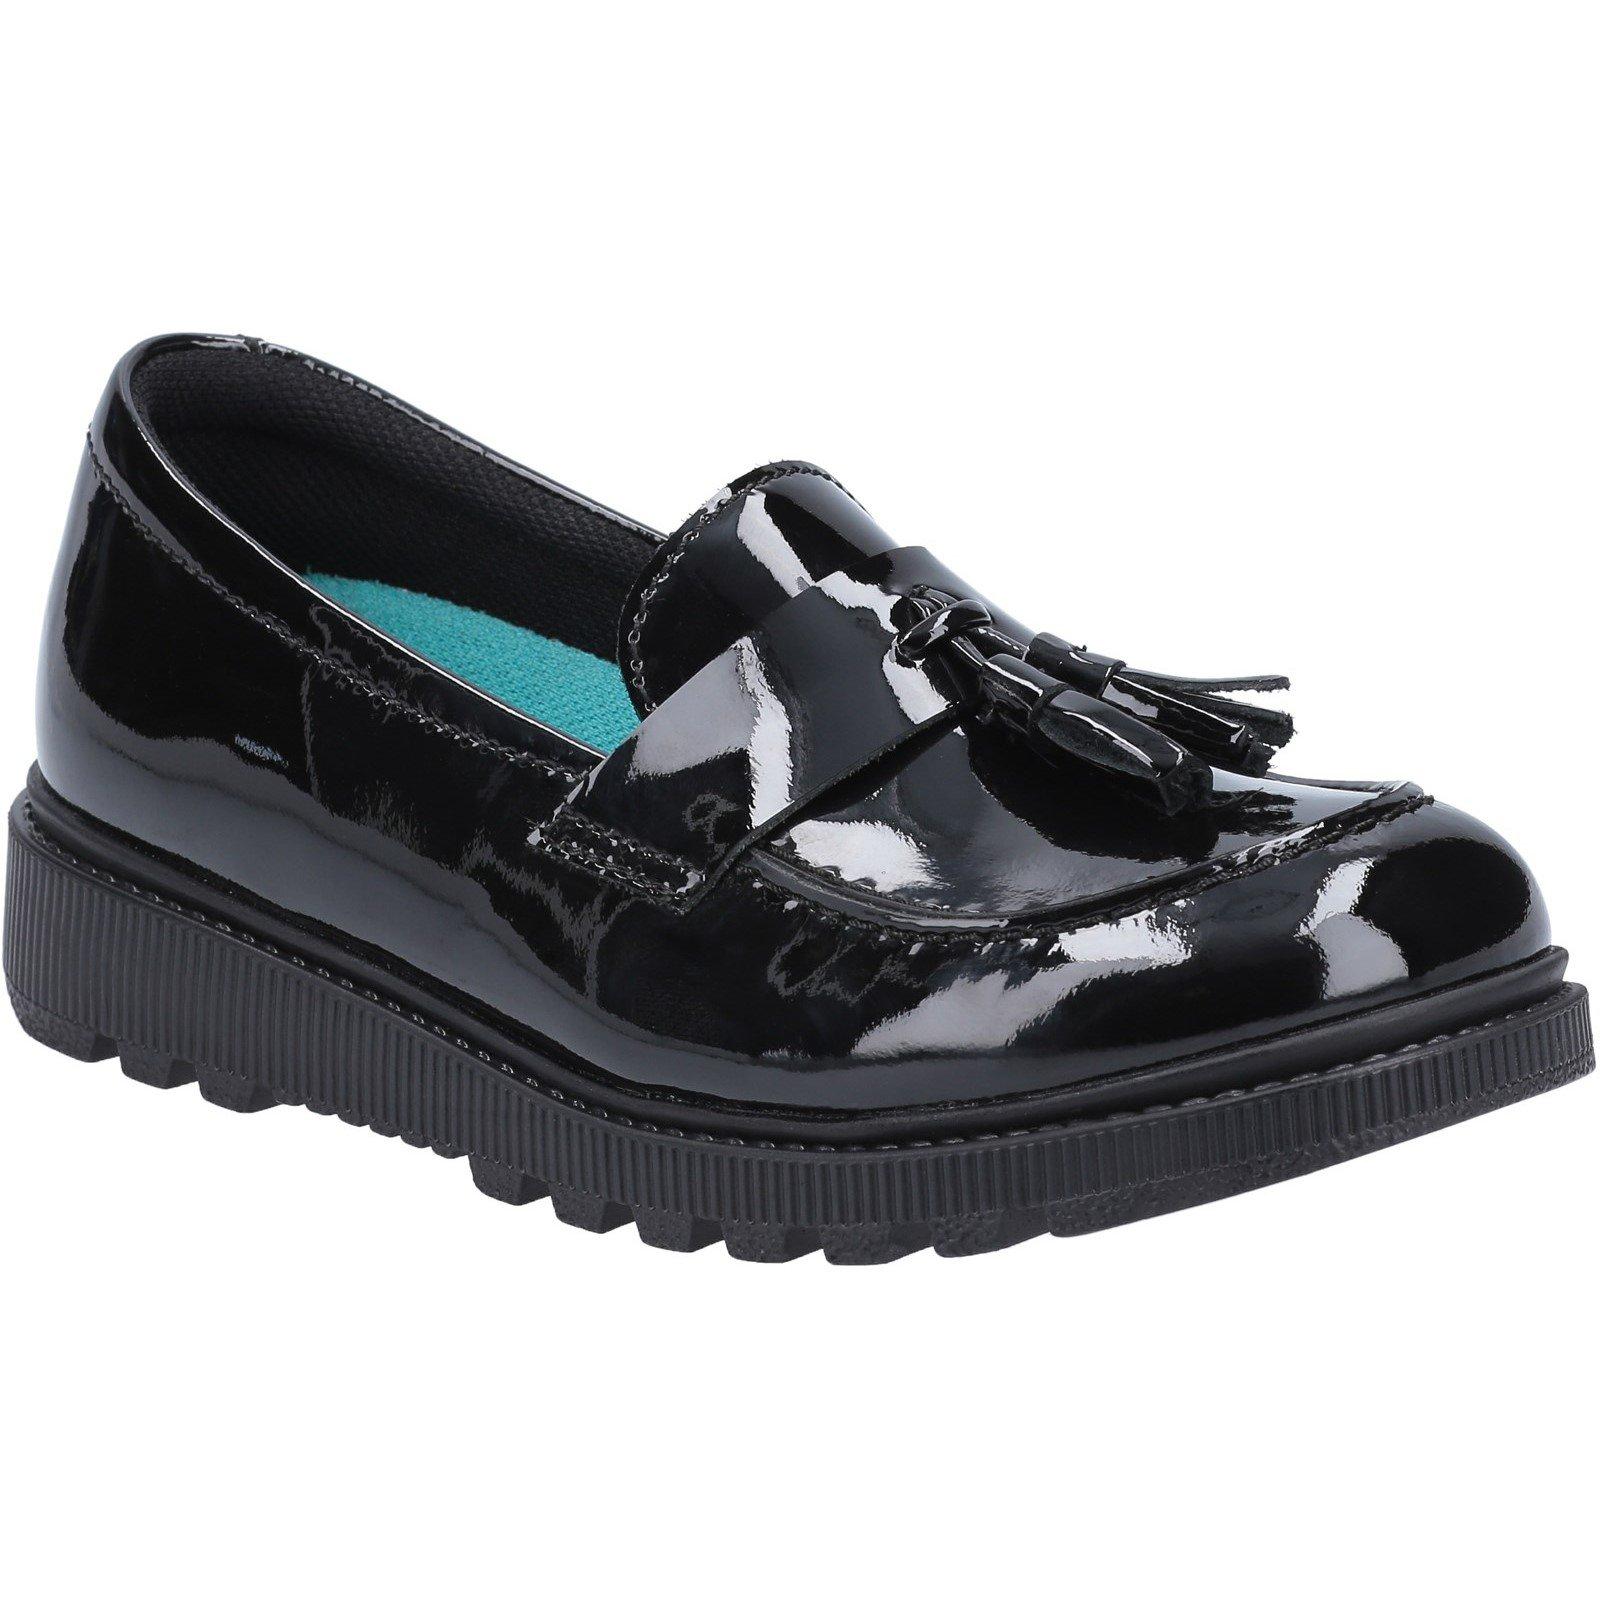 Hush Puppies Kid's Karen Senior School Shoe Patent Black 30828 - Patent Black 5